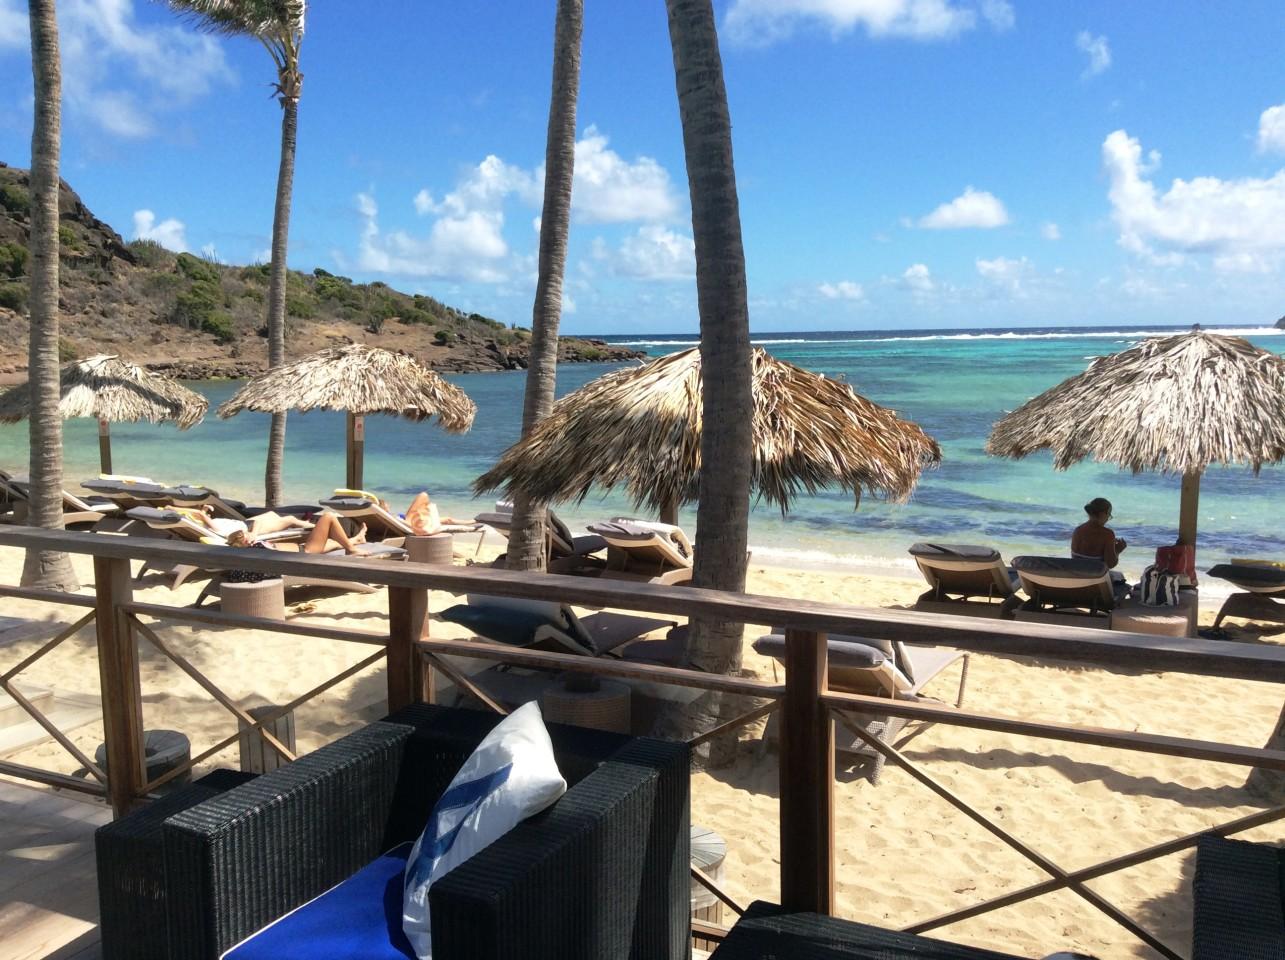 <em>Le Guanahani</em> ... an exquisite resort on très chic St Barth